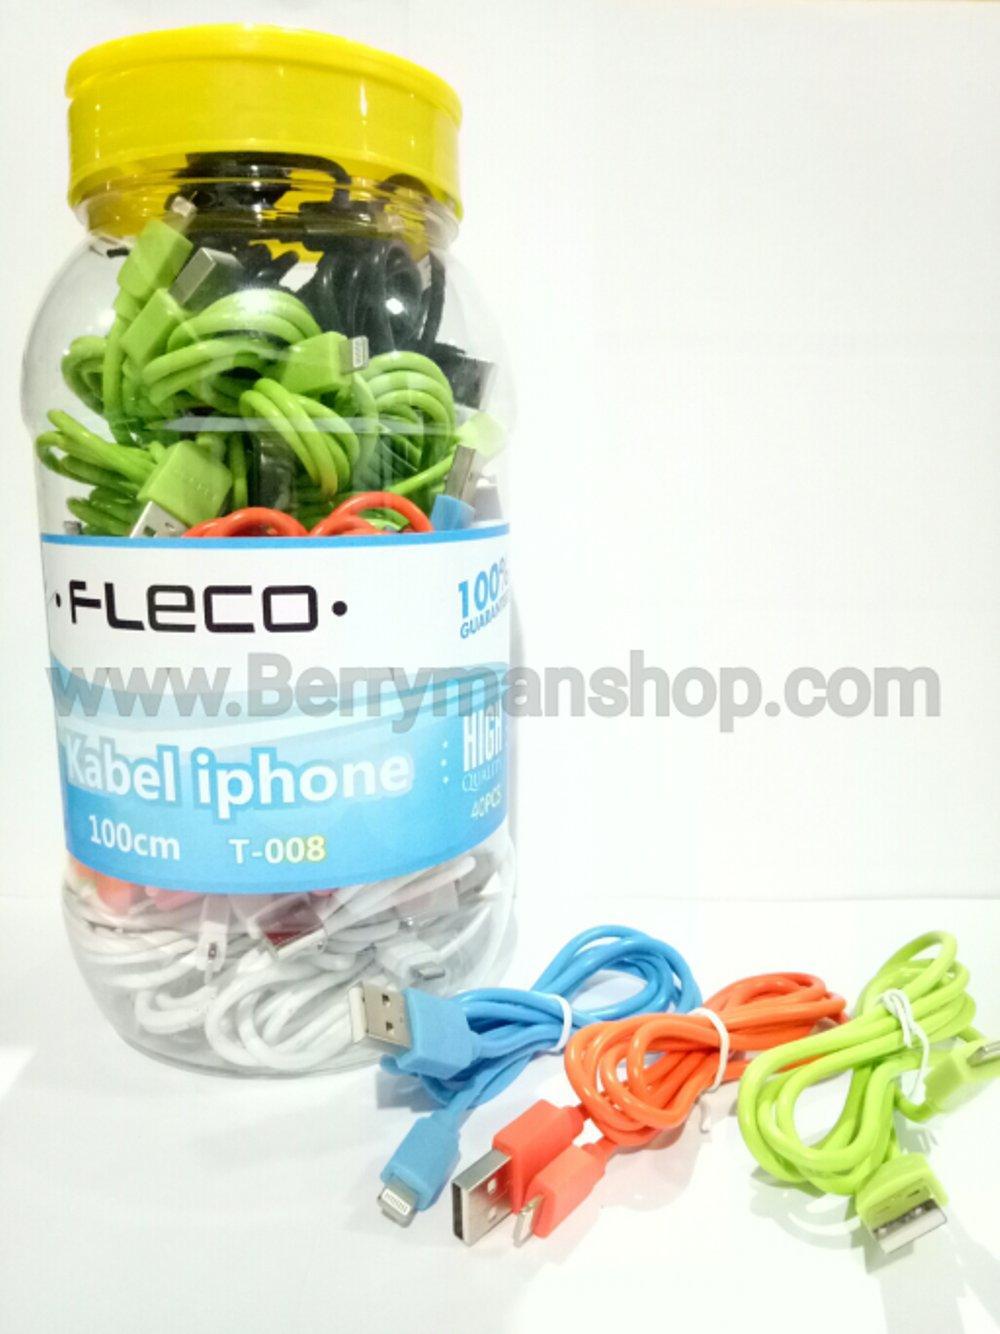 Buy Sell Cheapest Fleco 3 5 Best Quality Product Deals Teko Listrik 15 Ltr Otomatis Lt Kabel Data Iphone 100cm Bulat